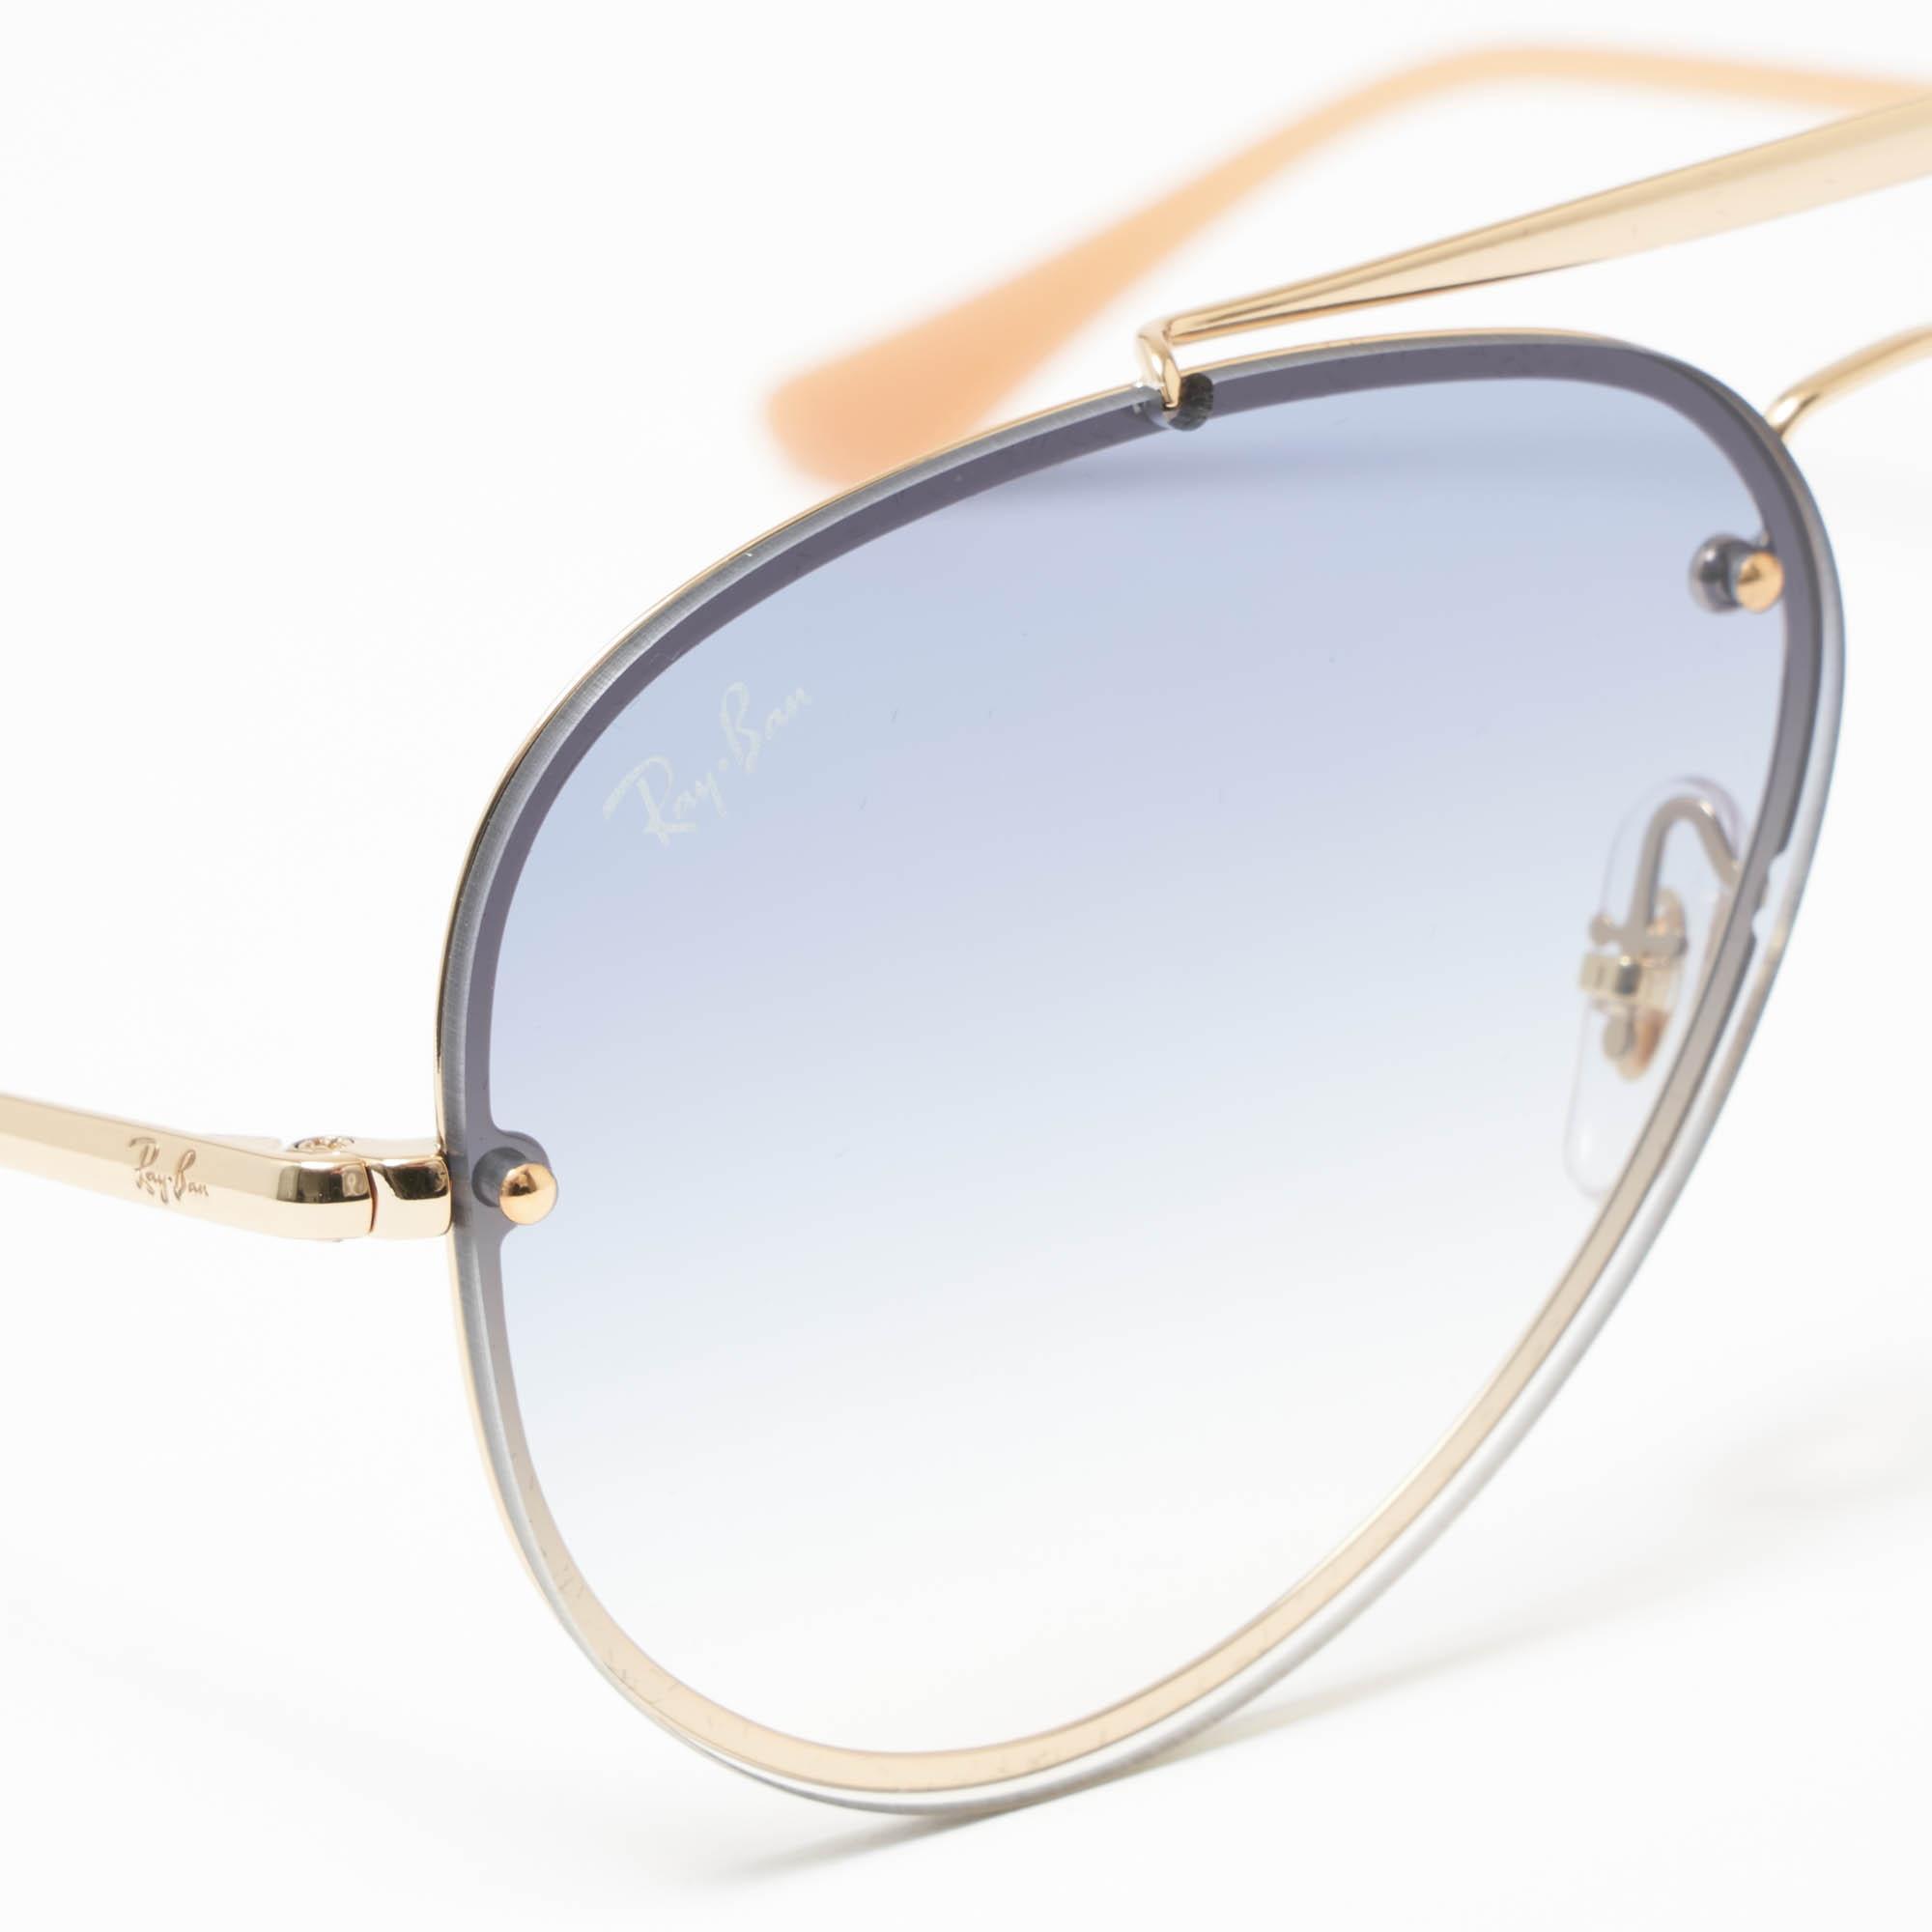 9baa7a857f Ray-Ban - Metallic Gold Blaze Aviator Sunglasses - Light Blue Gradient  Lenses for Men. View fullscreen